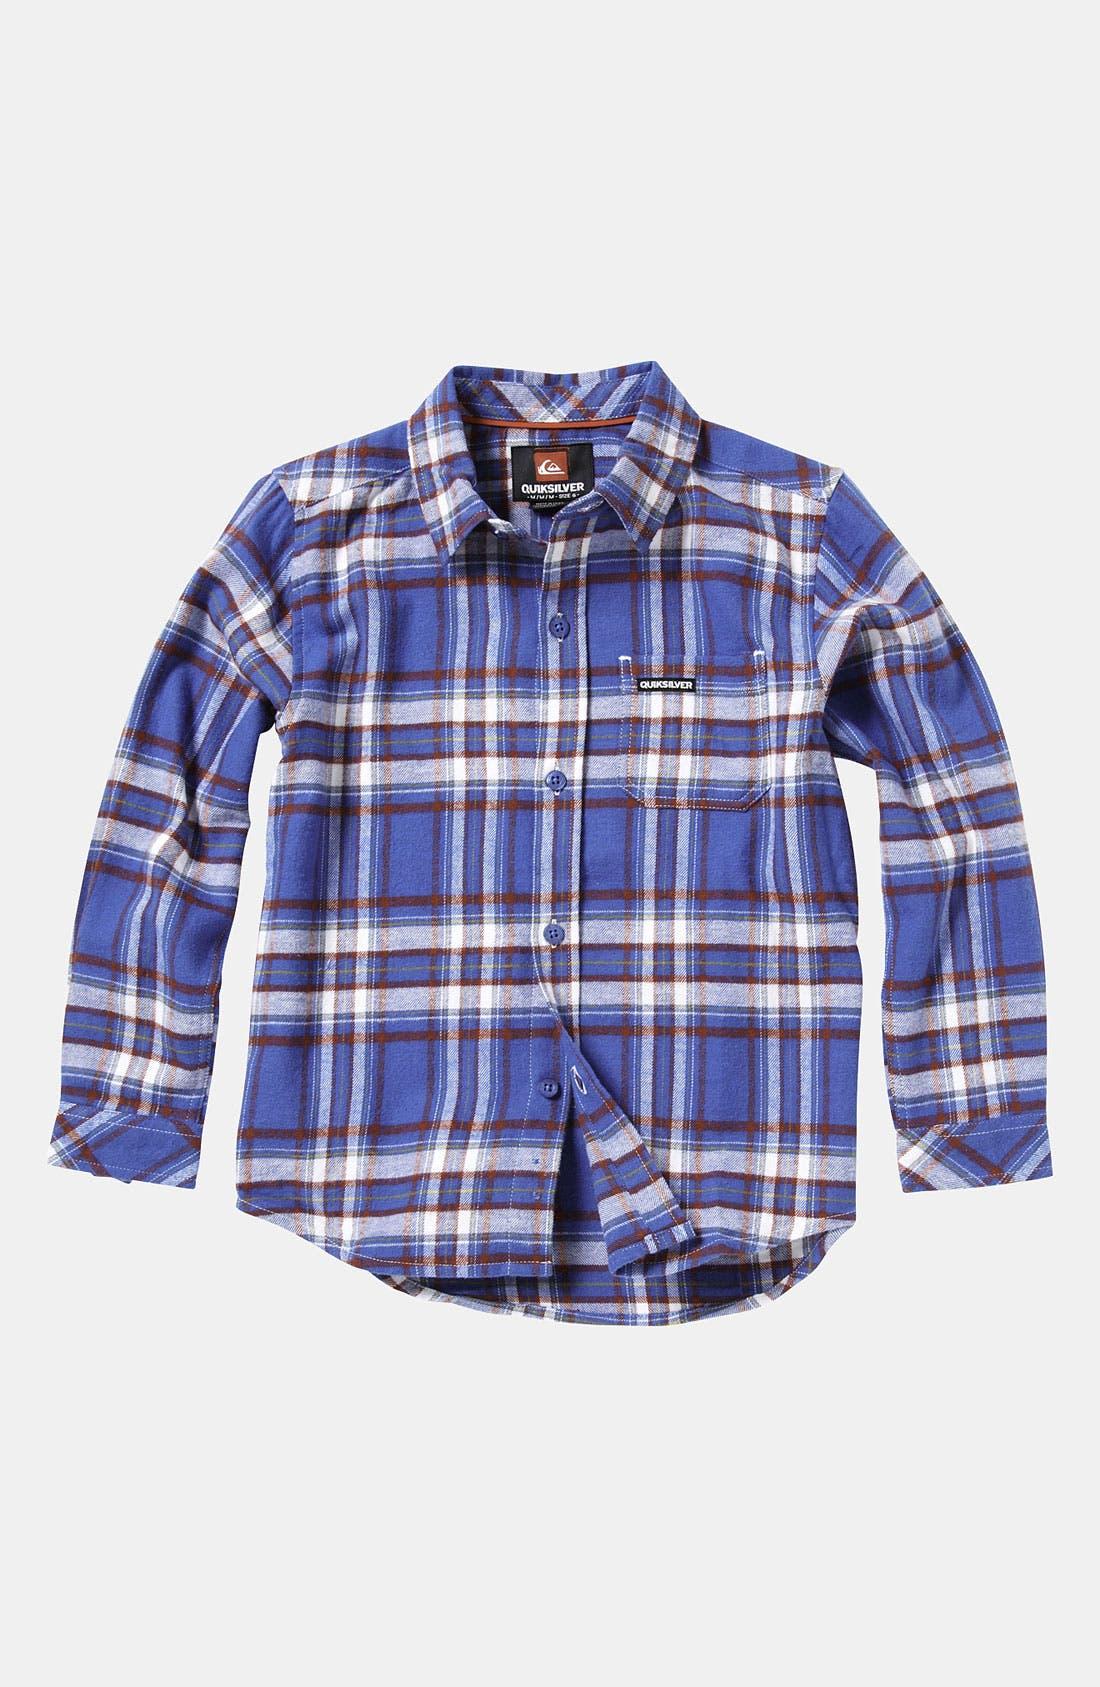 Alternate Image 1 Selected - Quiksilver 'Bunga Bunga' Woven Shirt (Little Boys)